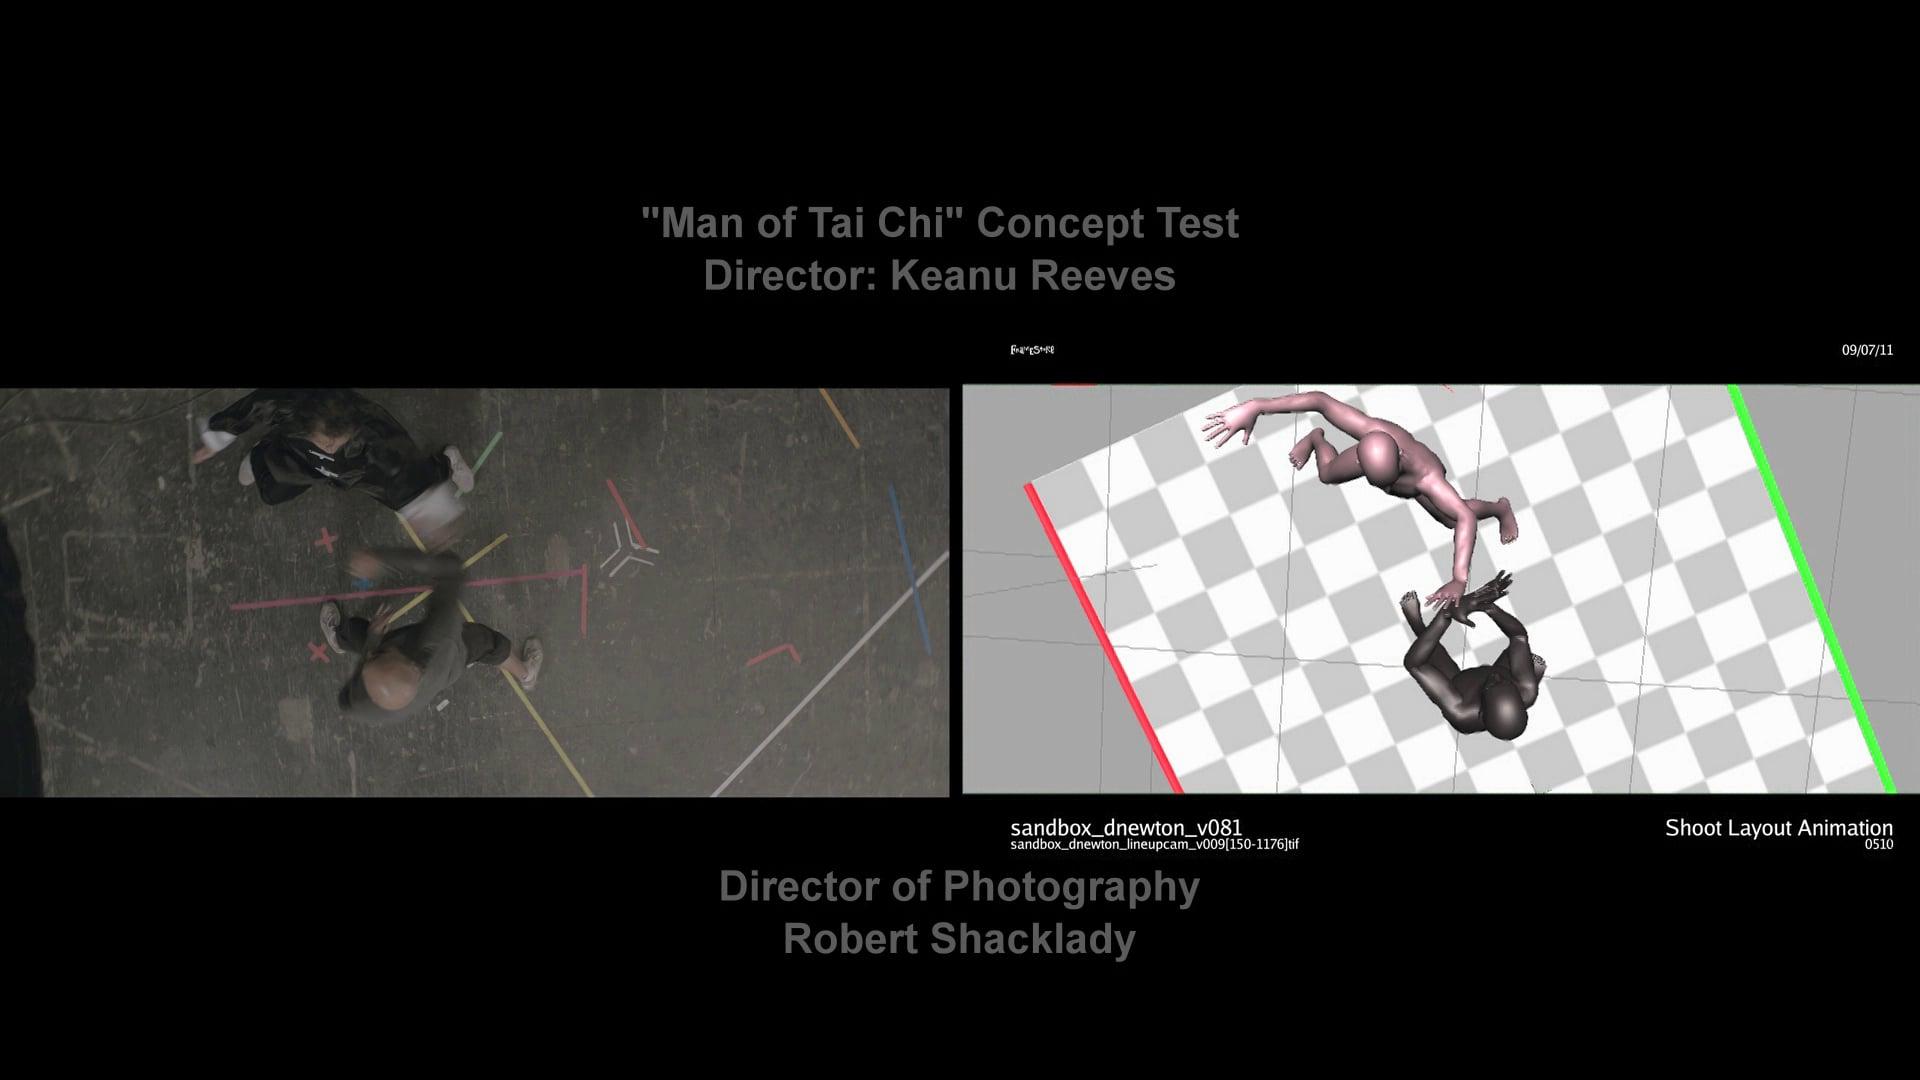 KR Proof of Concept Test